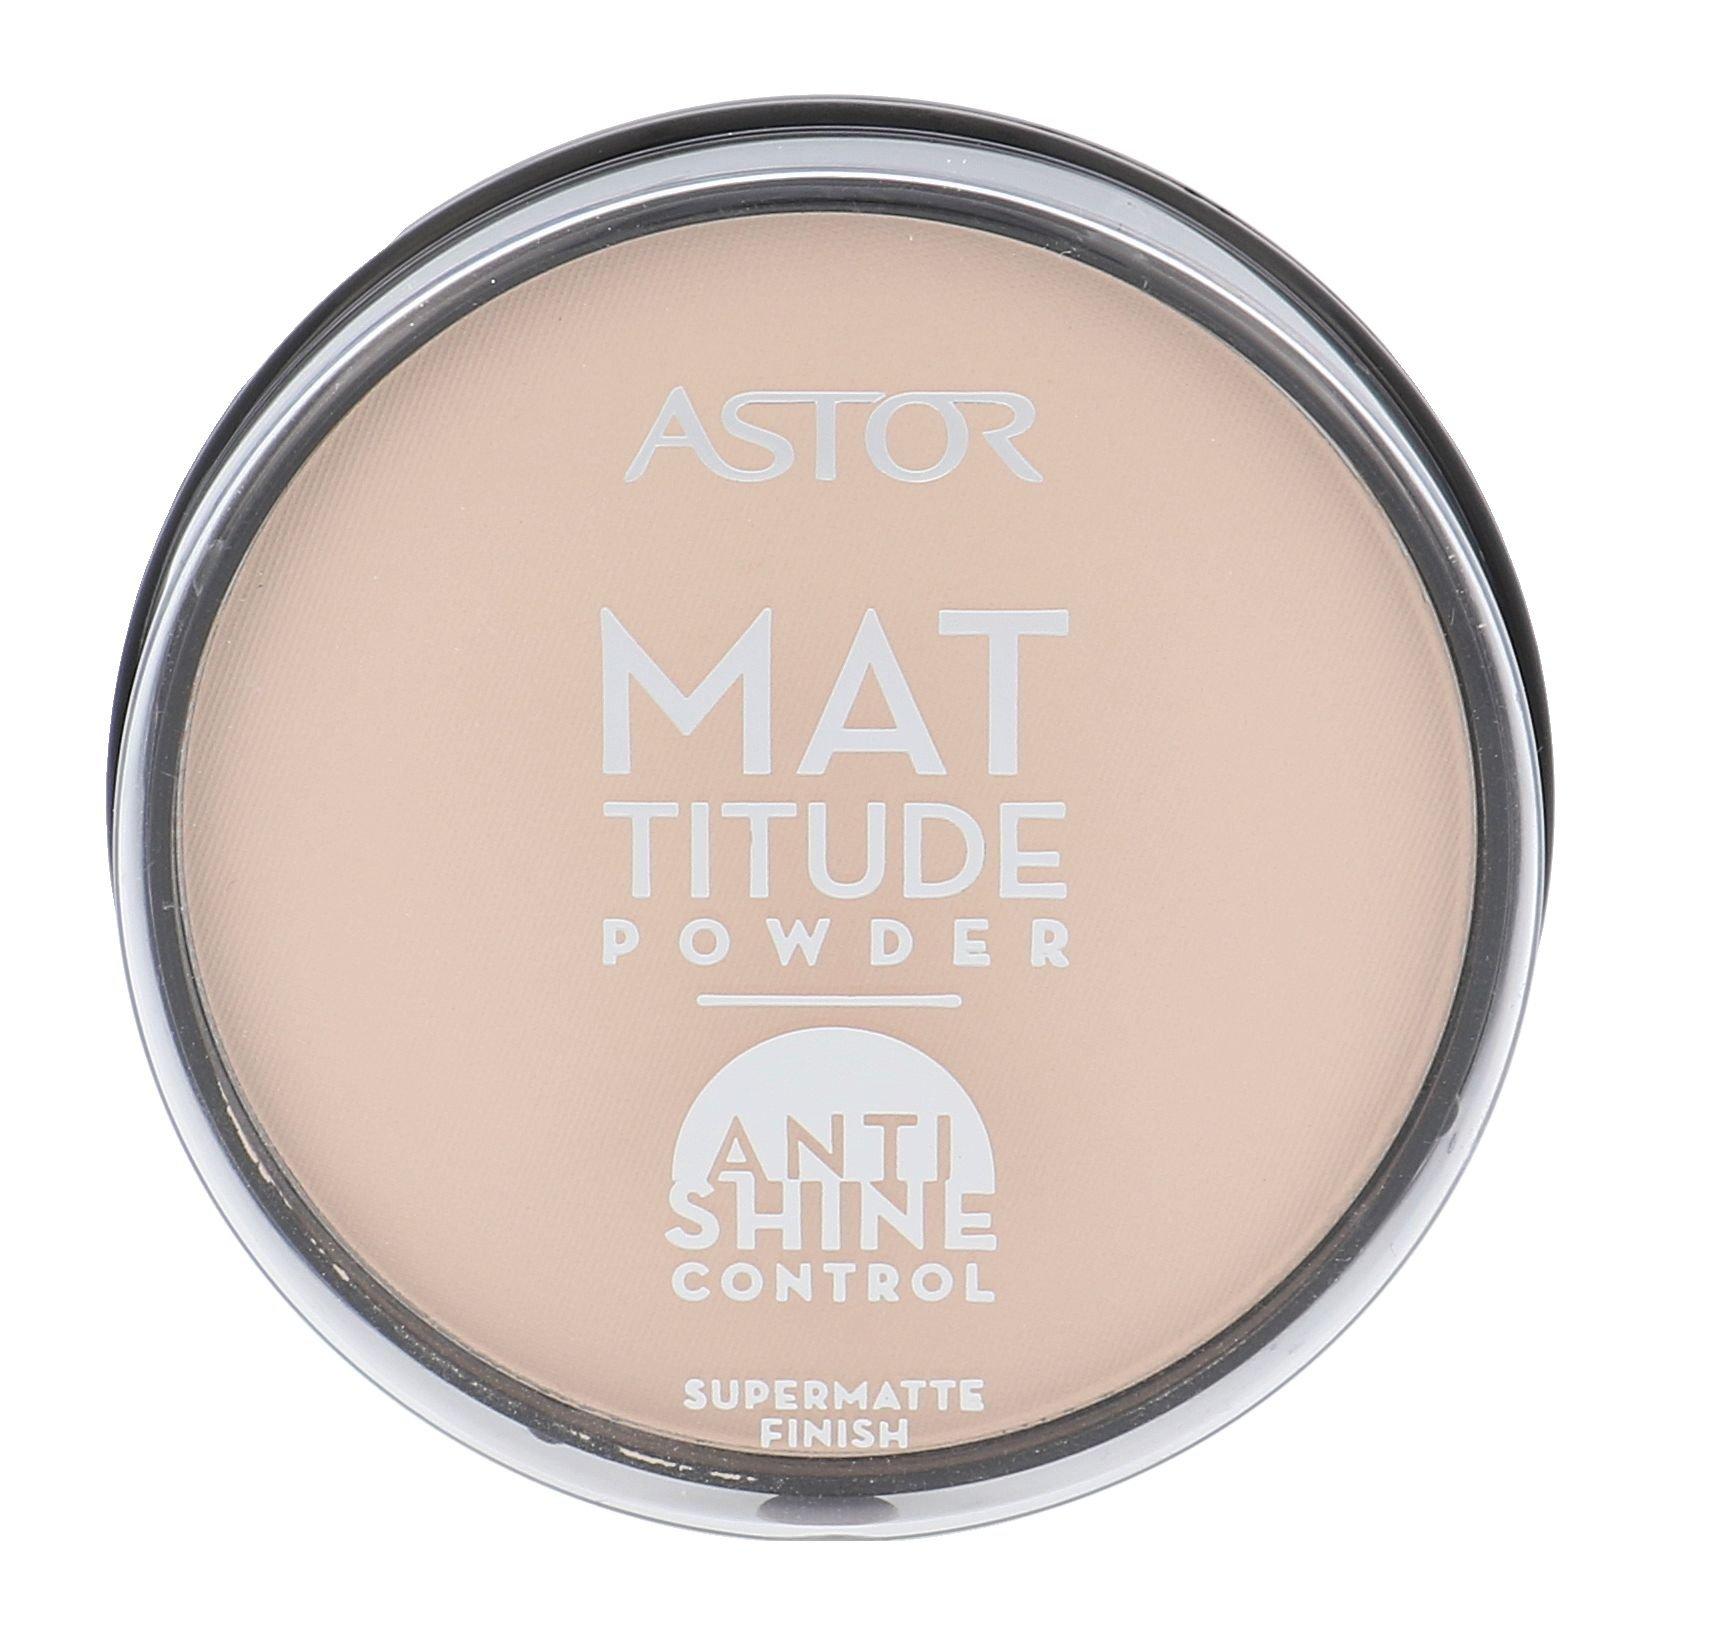 ASTOR Mattitude Cosmetic 14ml 002